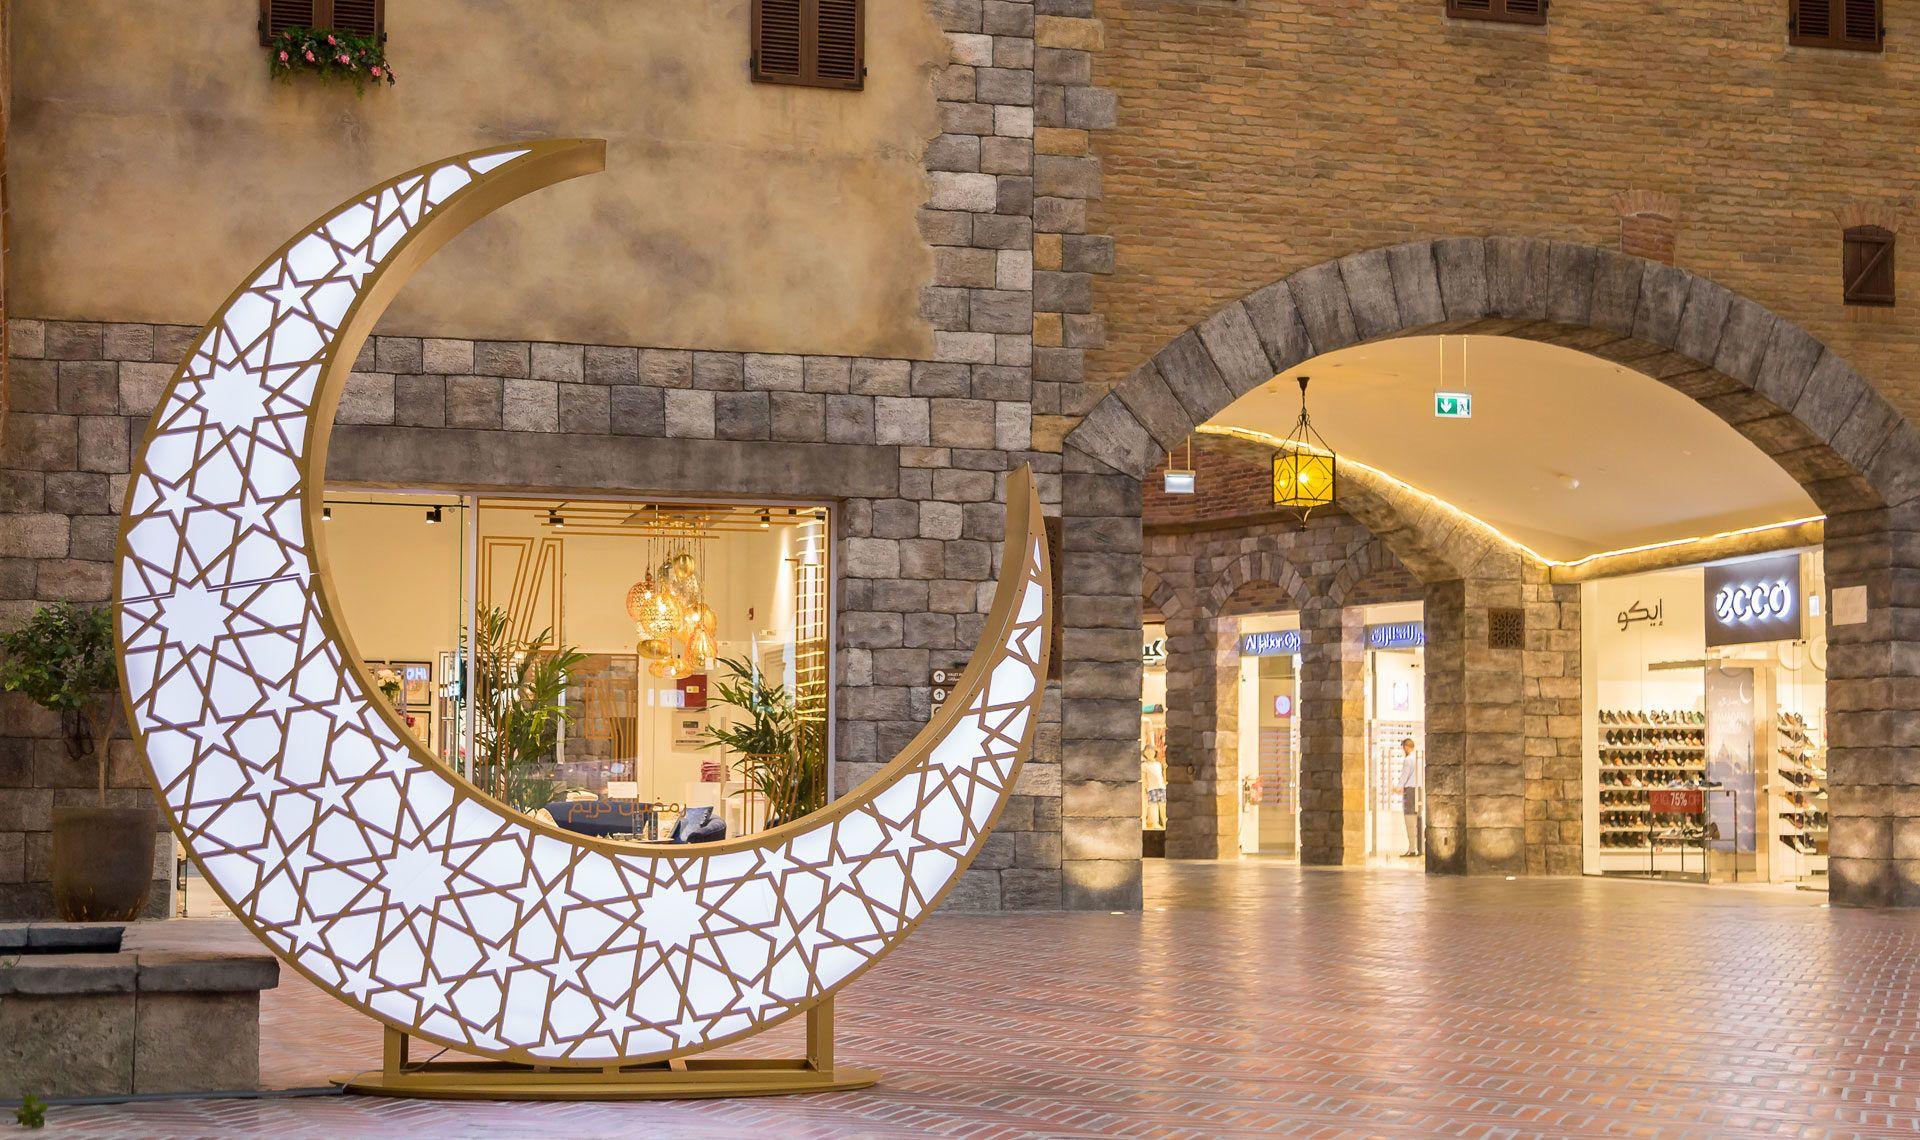 Lighting Up The Night For Ramadan Mk Illumination Mkillumination Ramadan Festivelighting Extraordina Ramadan Decorations Traditional Lighting Moon Decor